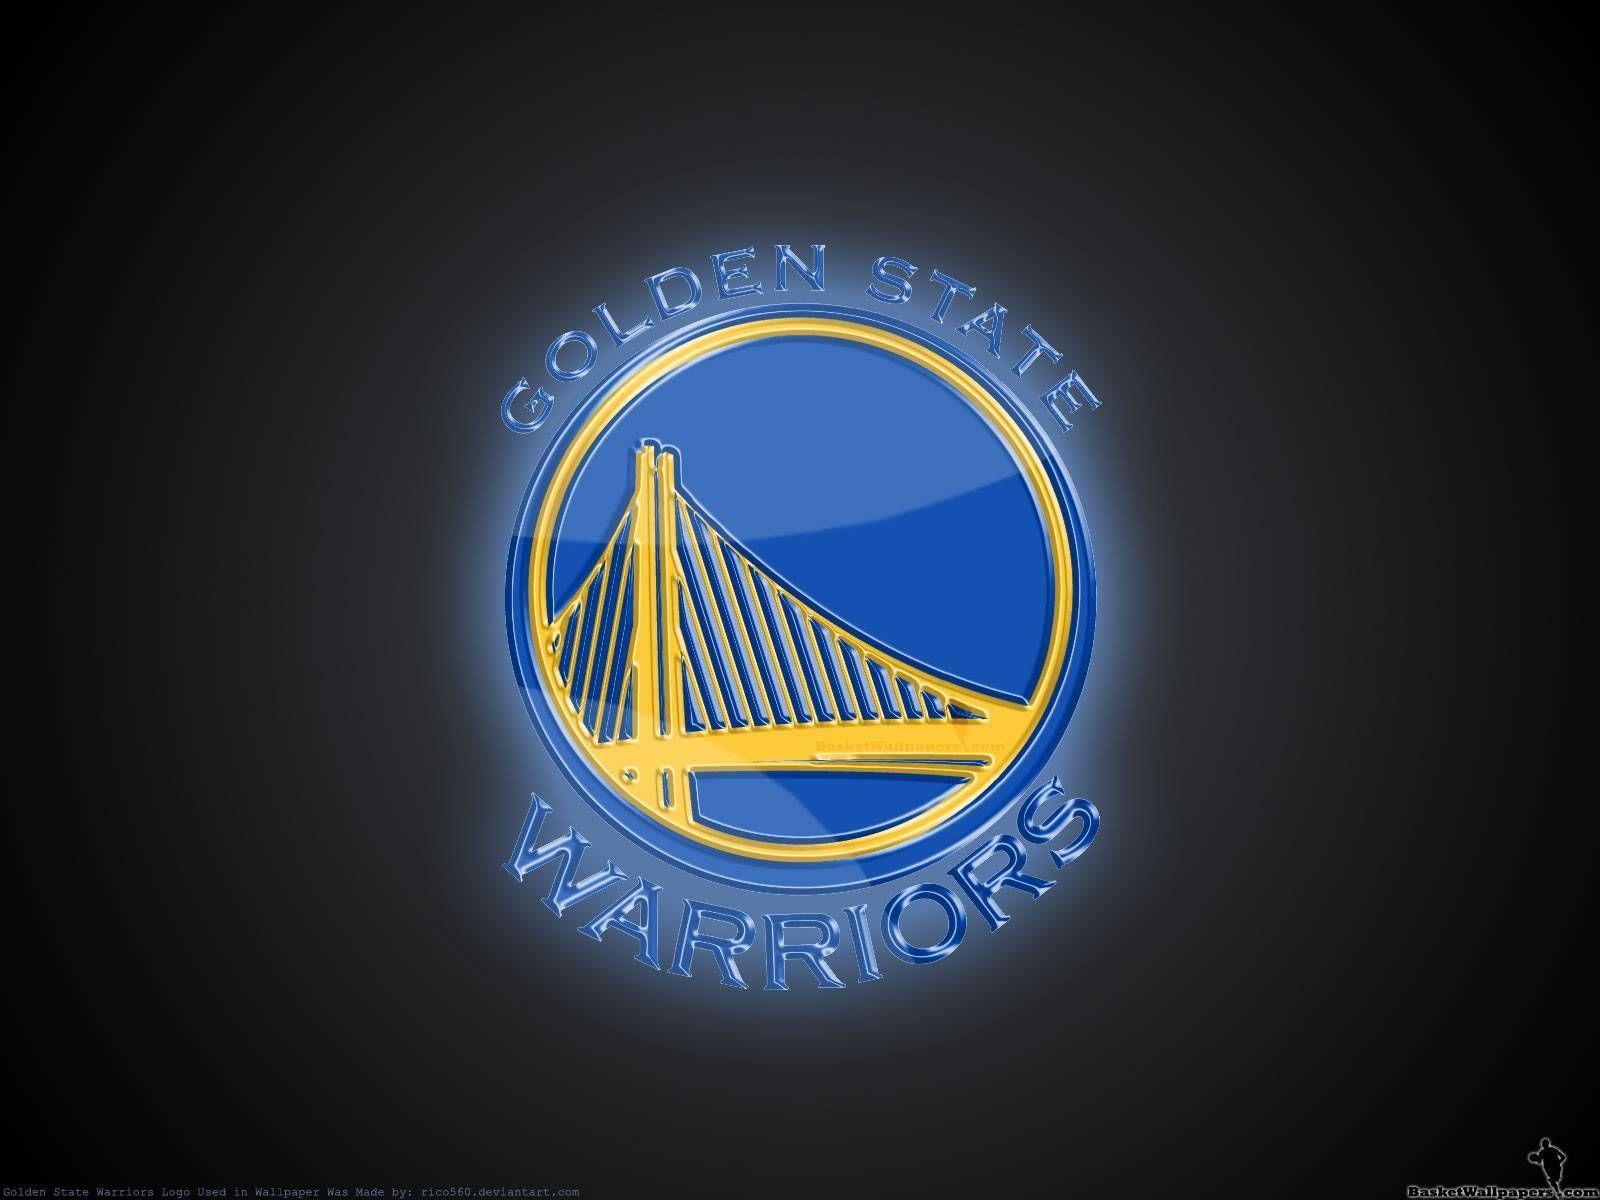 Golden State Warriors Wallpapers Top Free Golden State Warriors